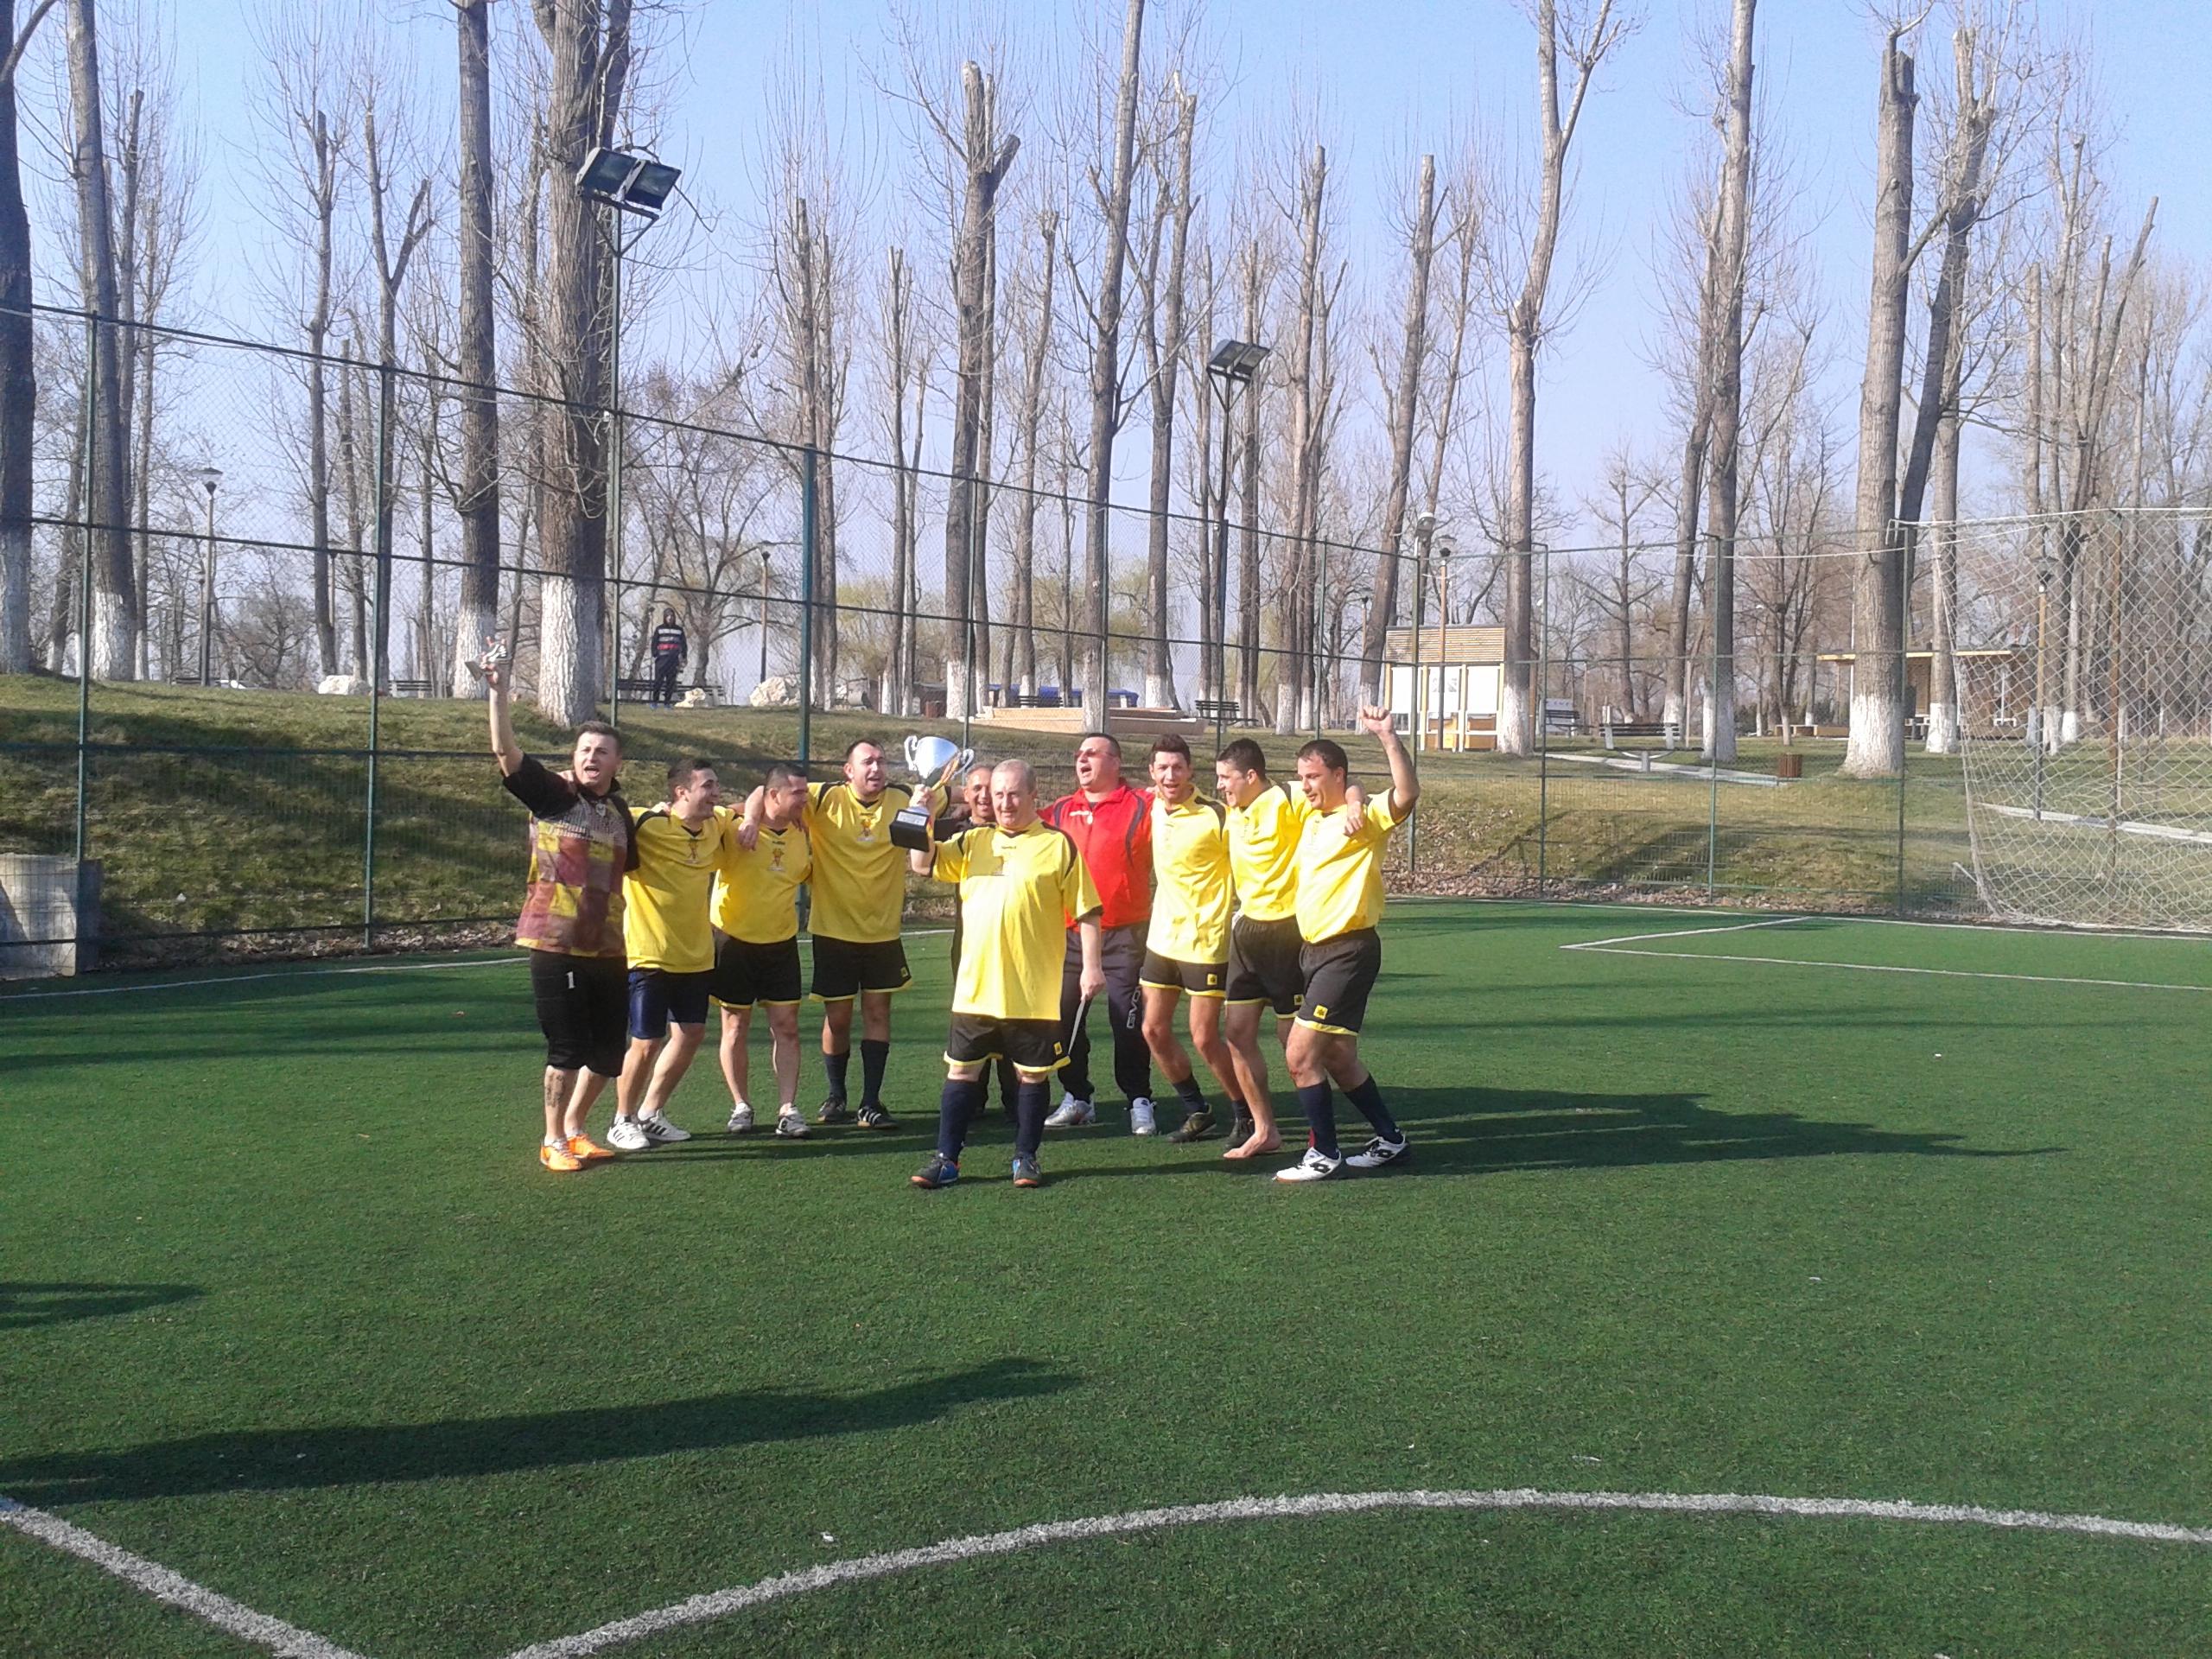 Bragadiru echipa castigatoare